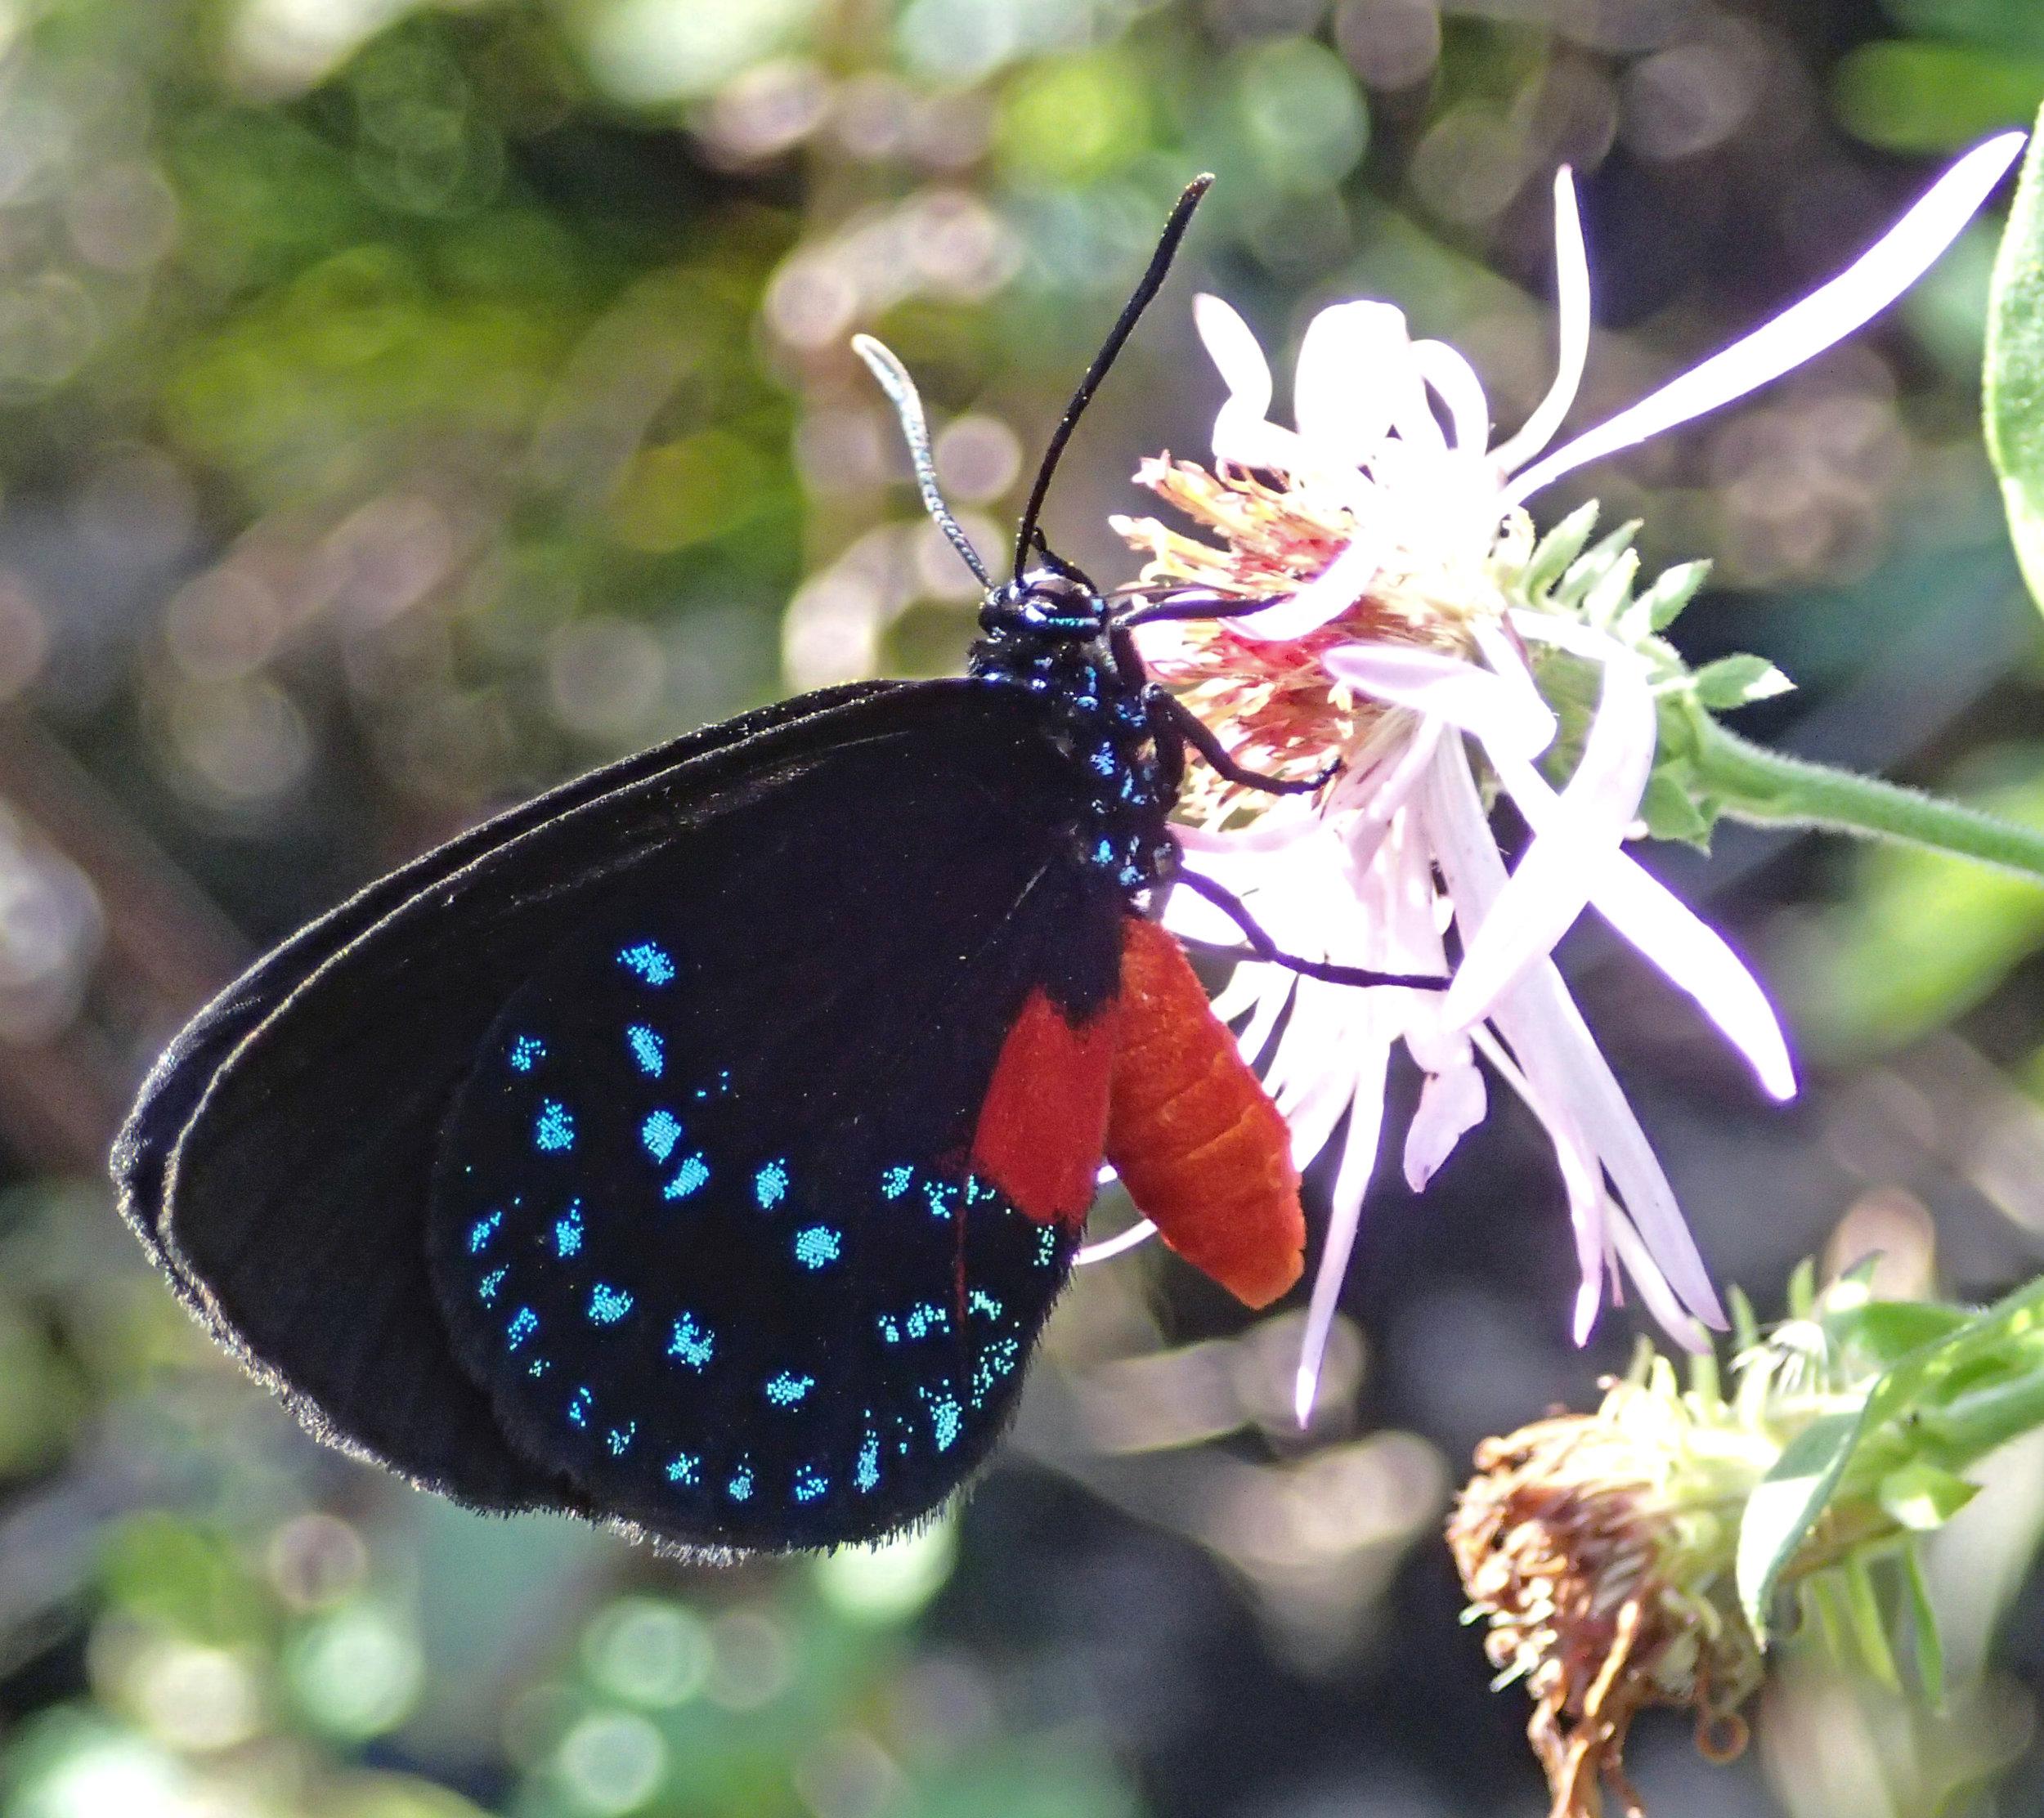 Eumaeus_atala_(atala_hairstreak_butterfly)_(Florida,_USA)_2_(17225486286).jpg